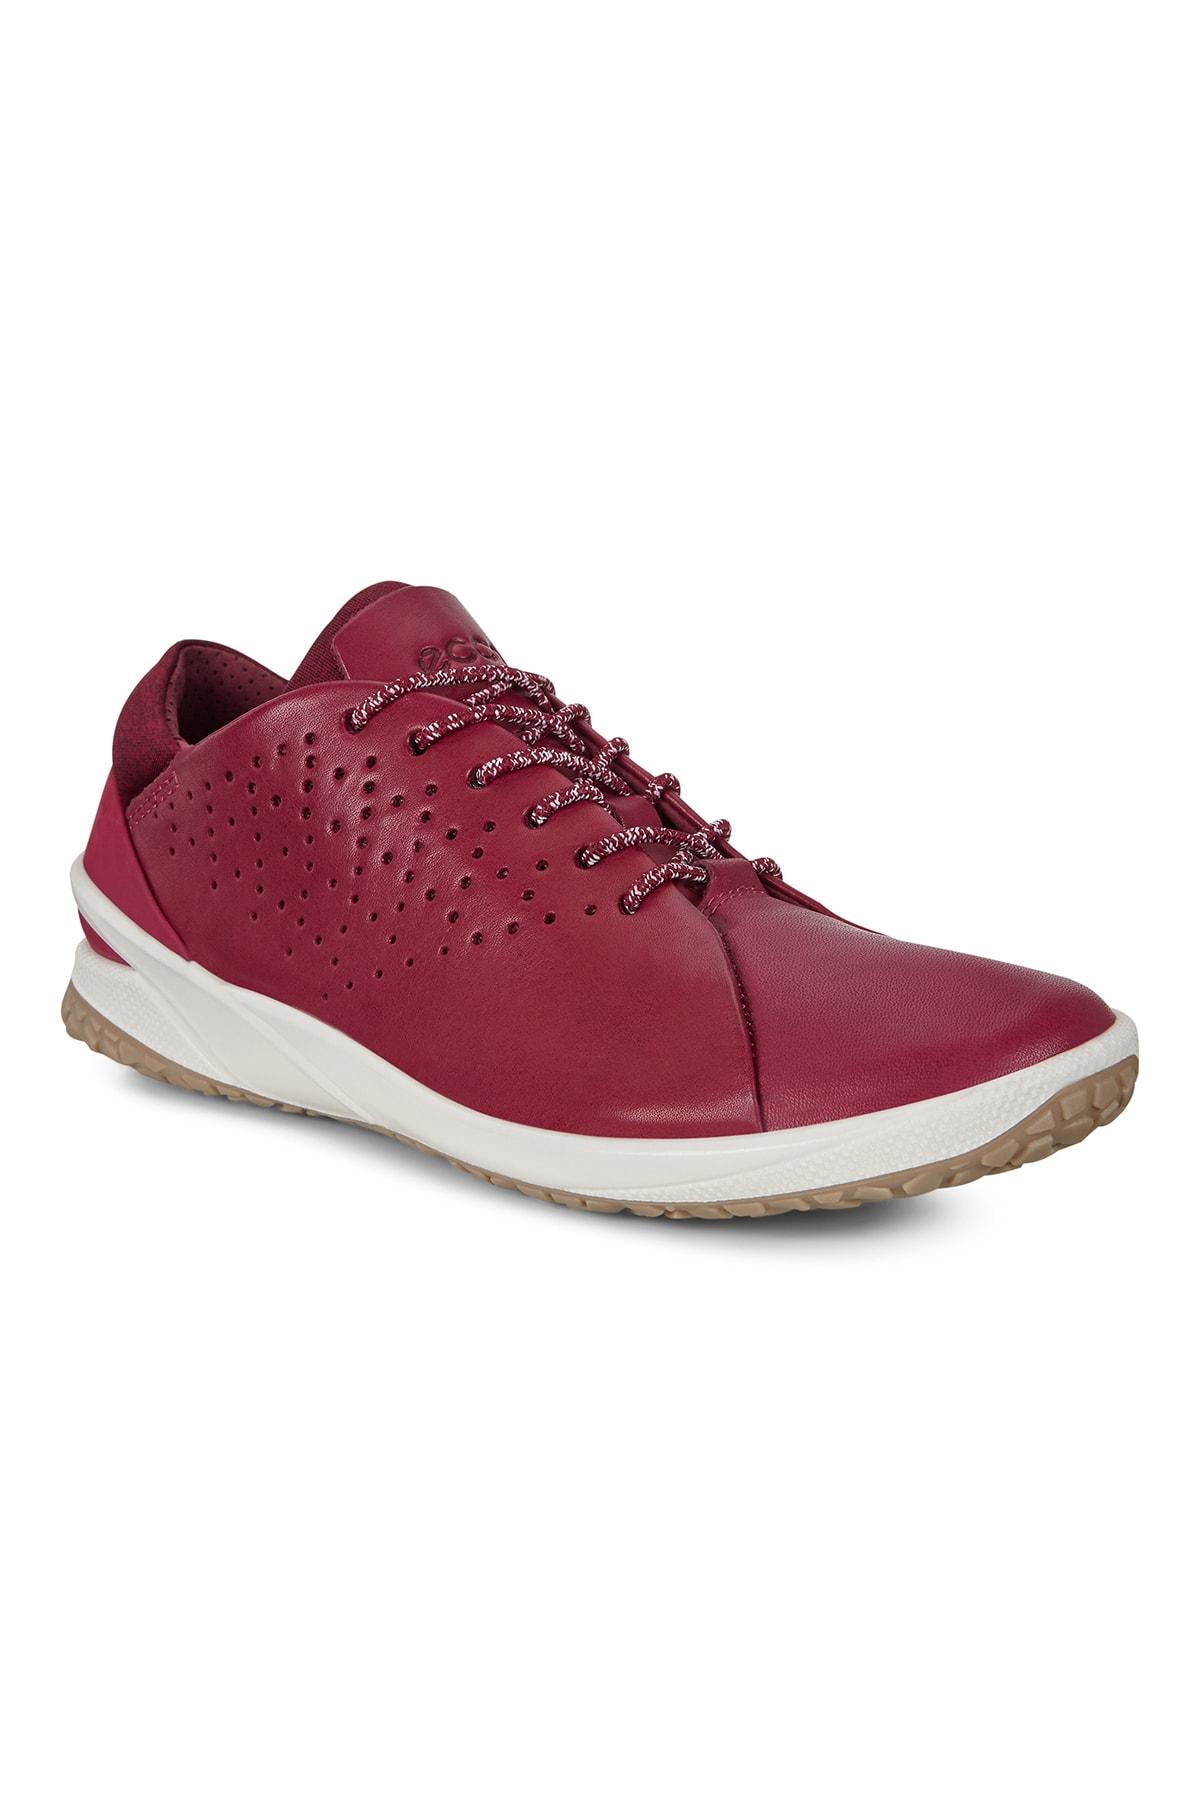 Ecco Kadın Outdoor Ayakkabı Biom Life Sangria Kirmizi 880313